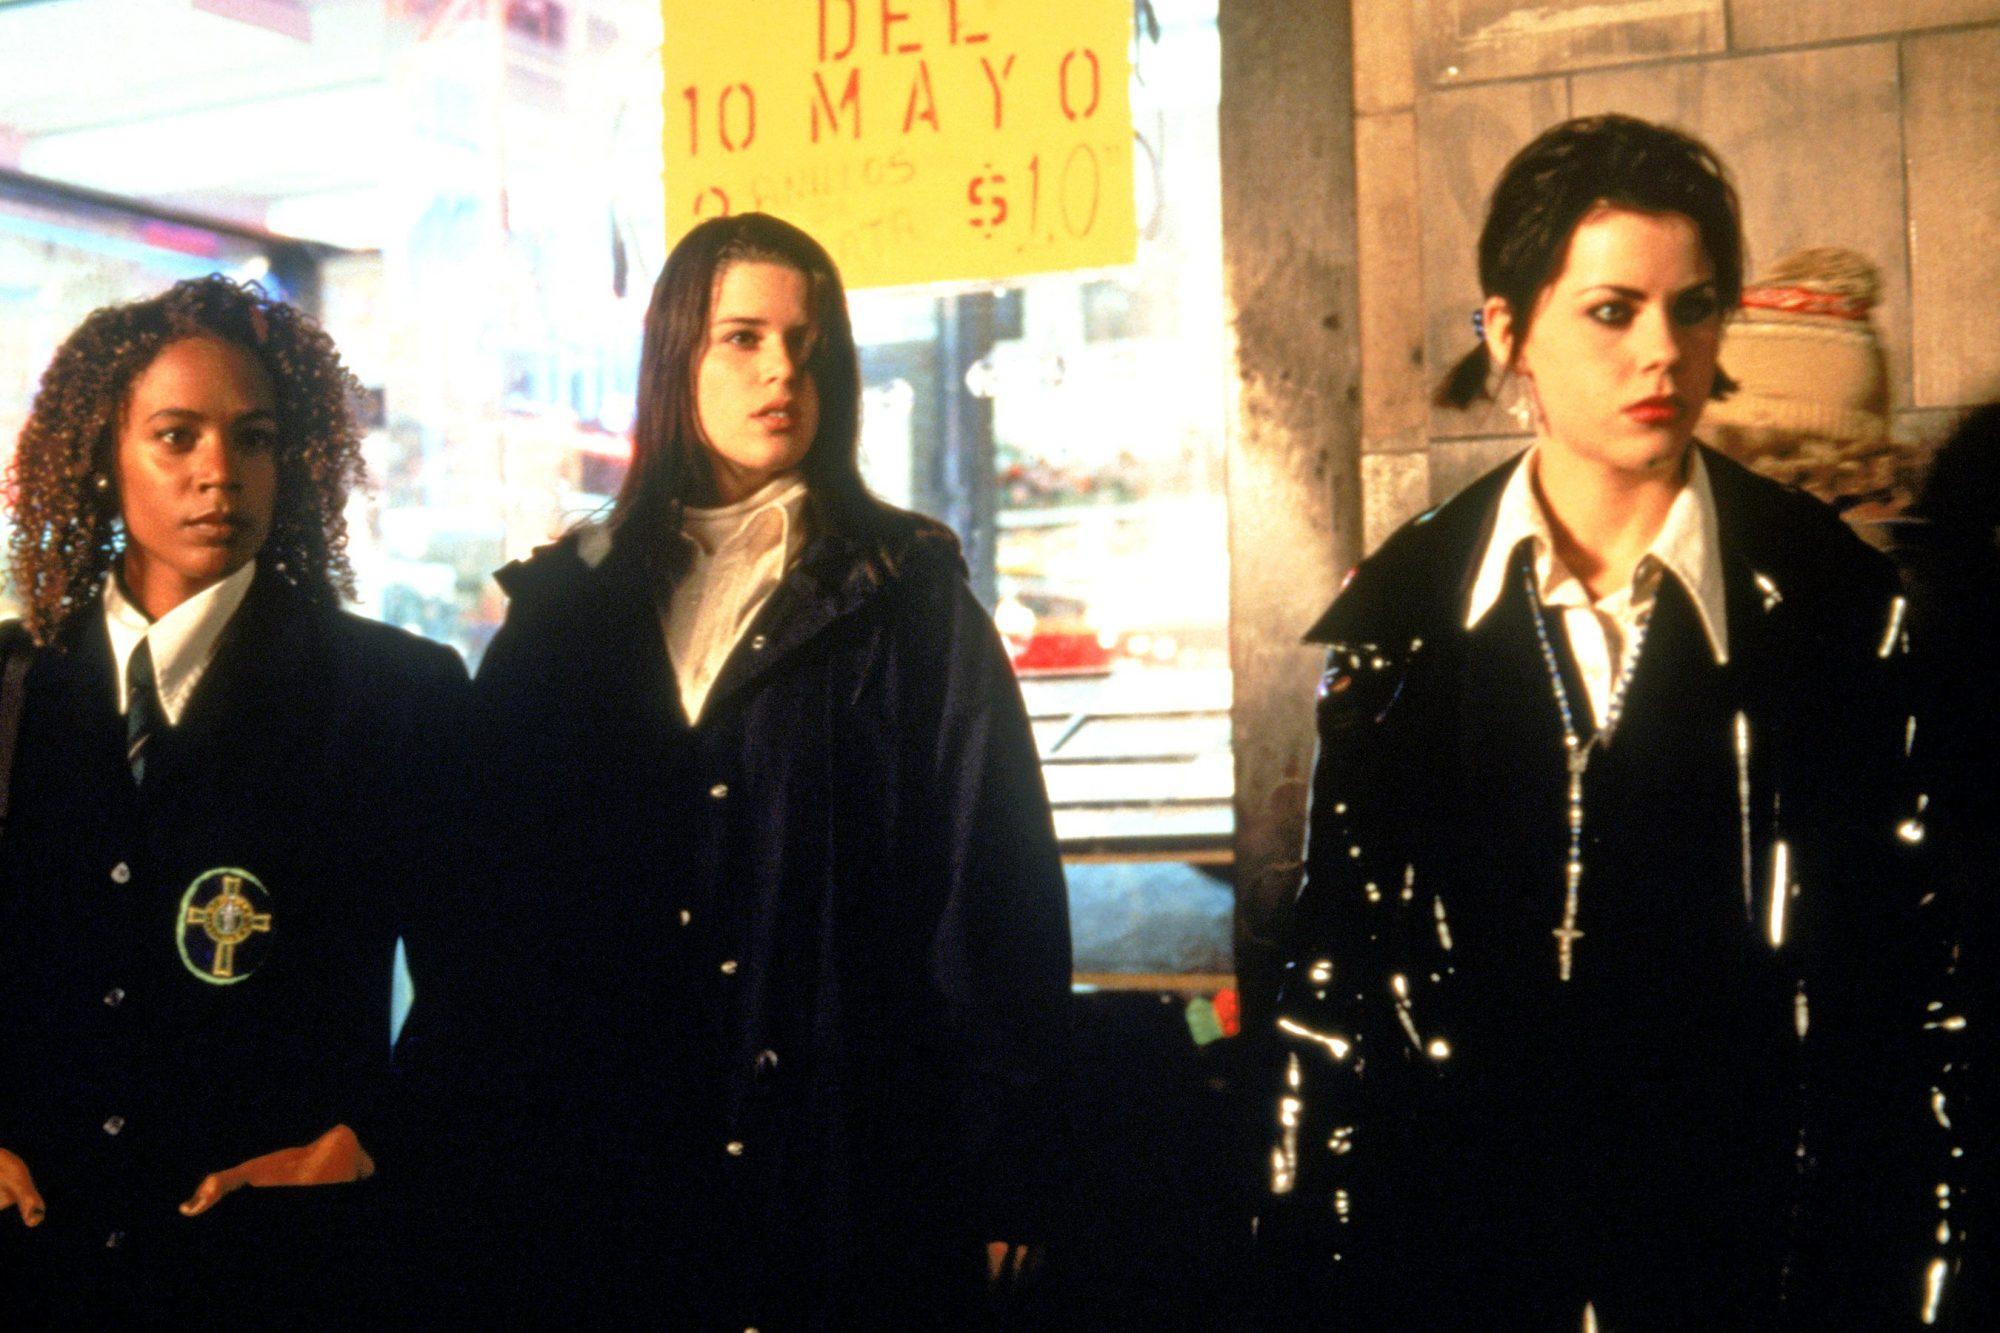 THE CRAFT, Rachel True, Neve Campbell, Fairuza Balk, 1996, (c) Columbia/courtesy Everett Collection